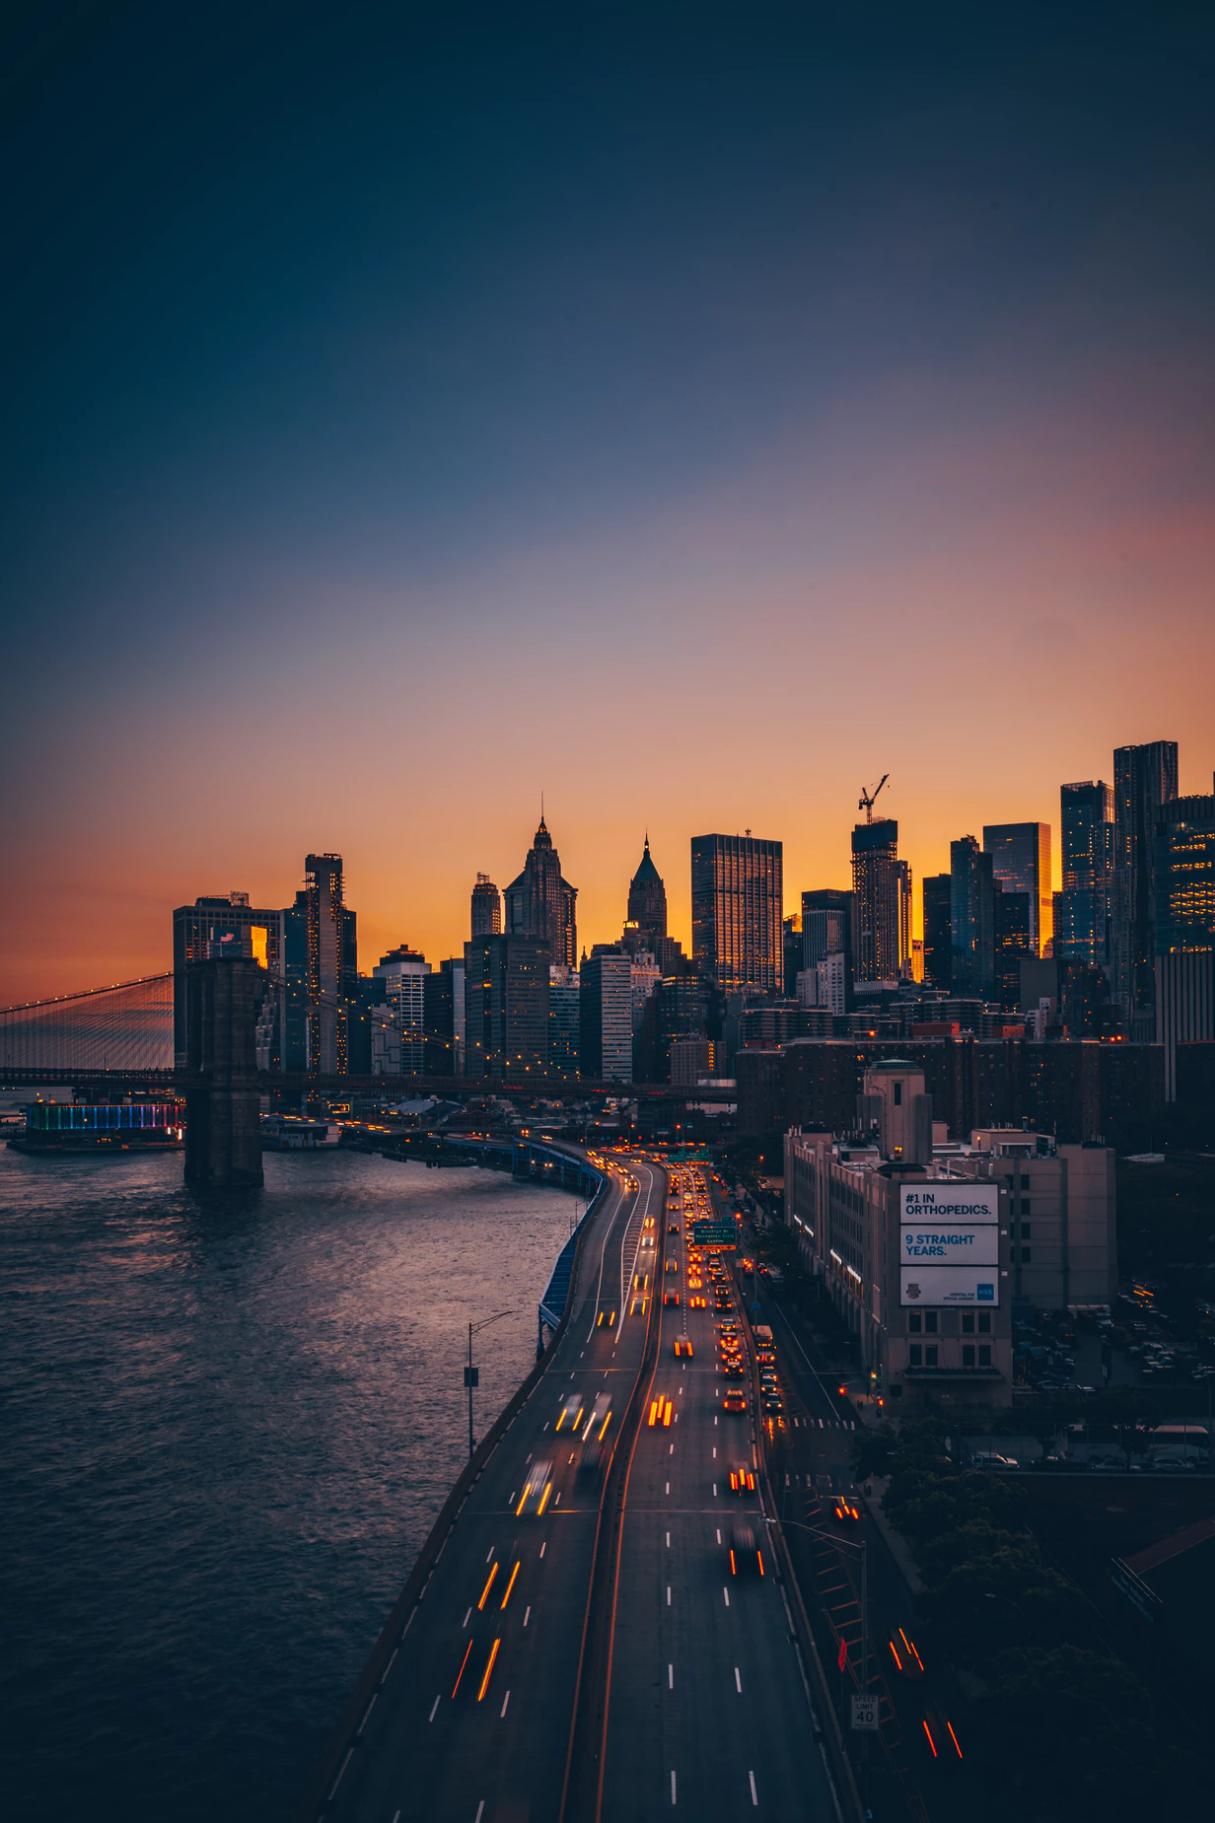 Author Lerone Pieters Contact Https Unsplash Com Thevantagepoint718 Unsplash Freestock Stock M City Landscape New York City Photos New York Wallpaper